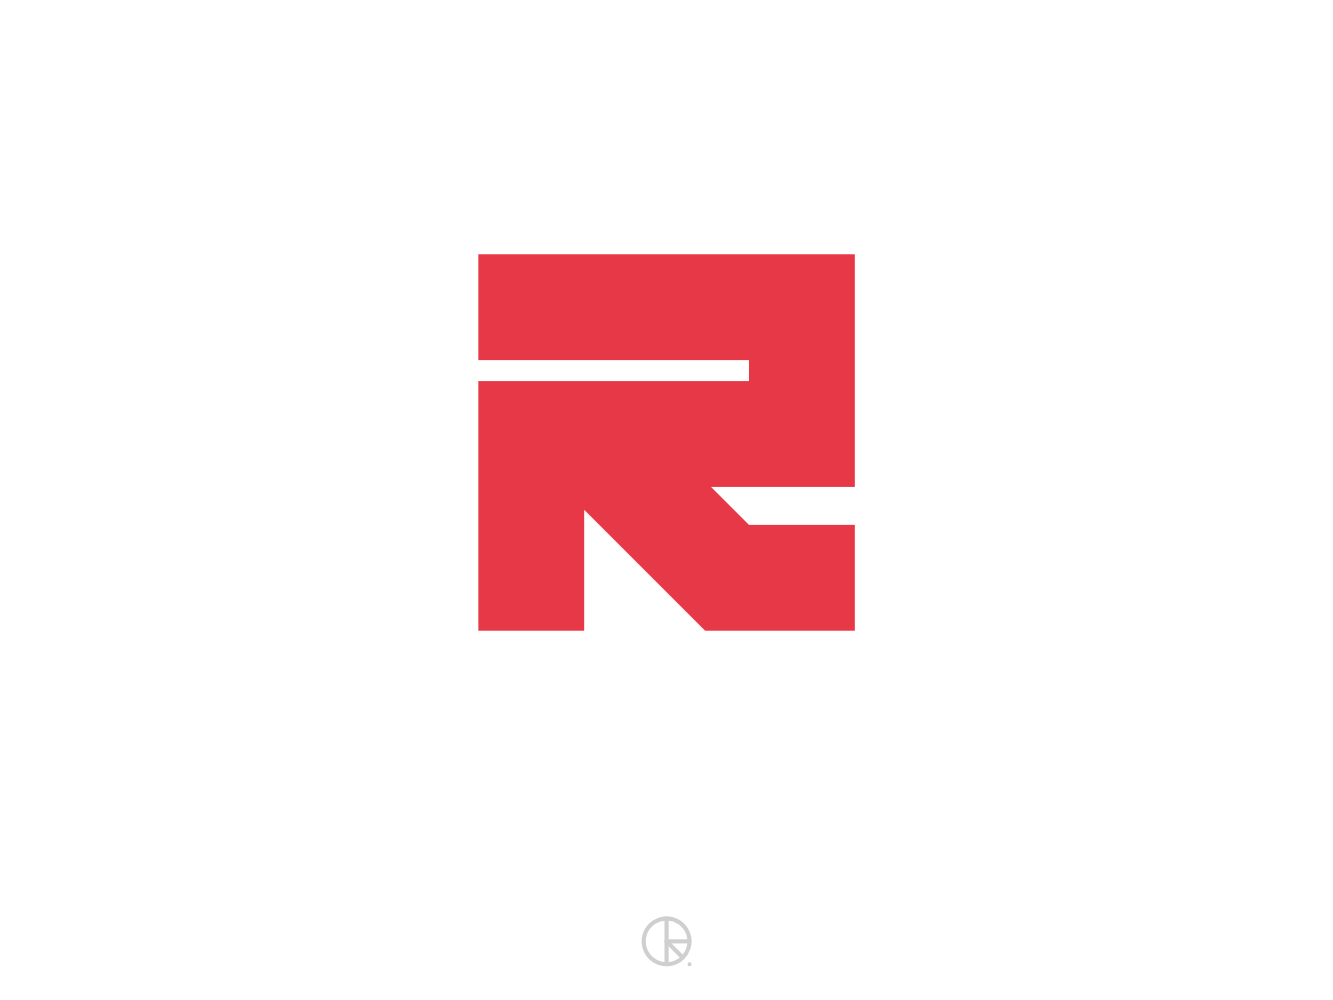 R r 36daysoftype-r typography lettermark monogram symbol mark icon golden ratio branding logo minimal 36daysoftype06 36dayoftype 36 days of type